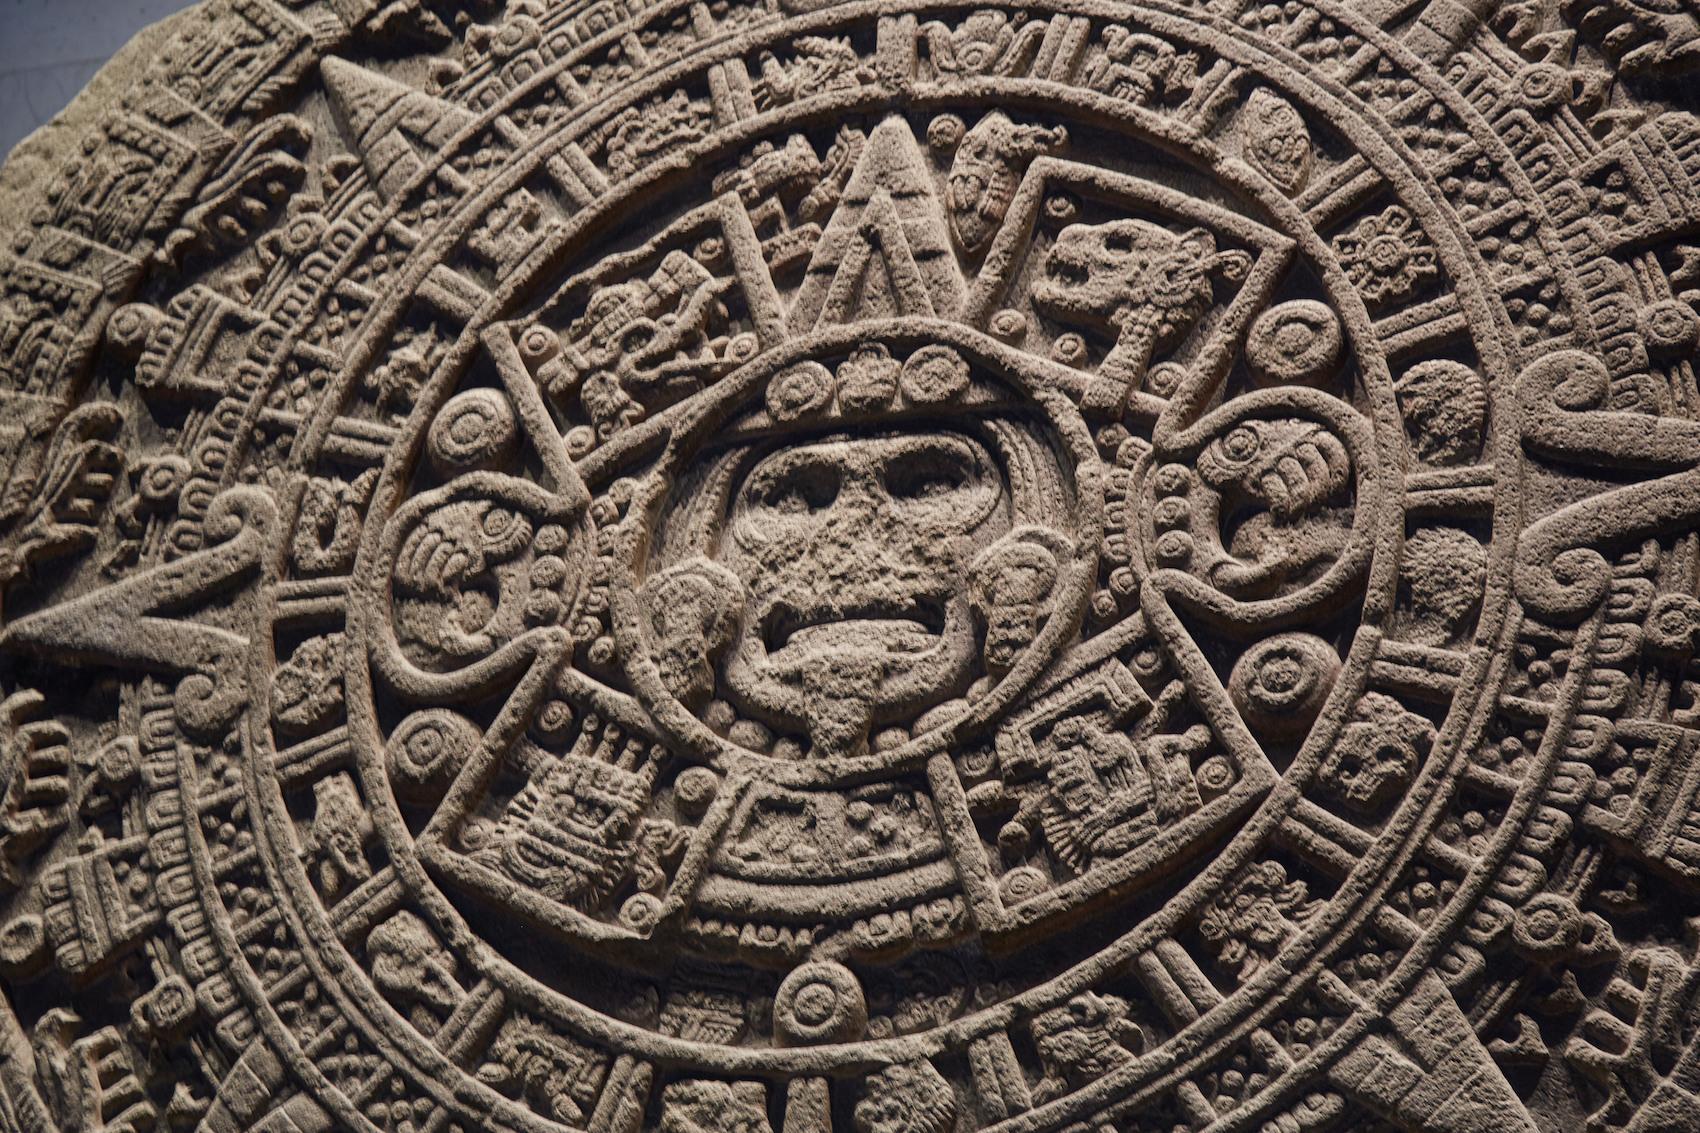 Aztec Sun Disk